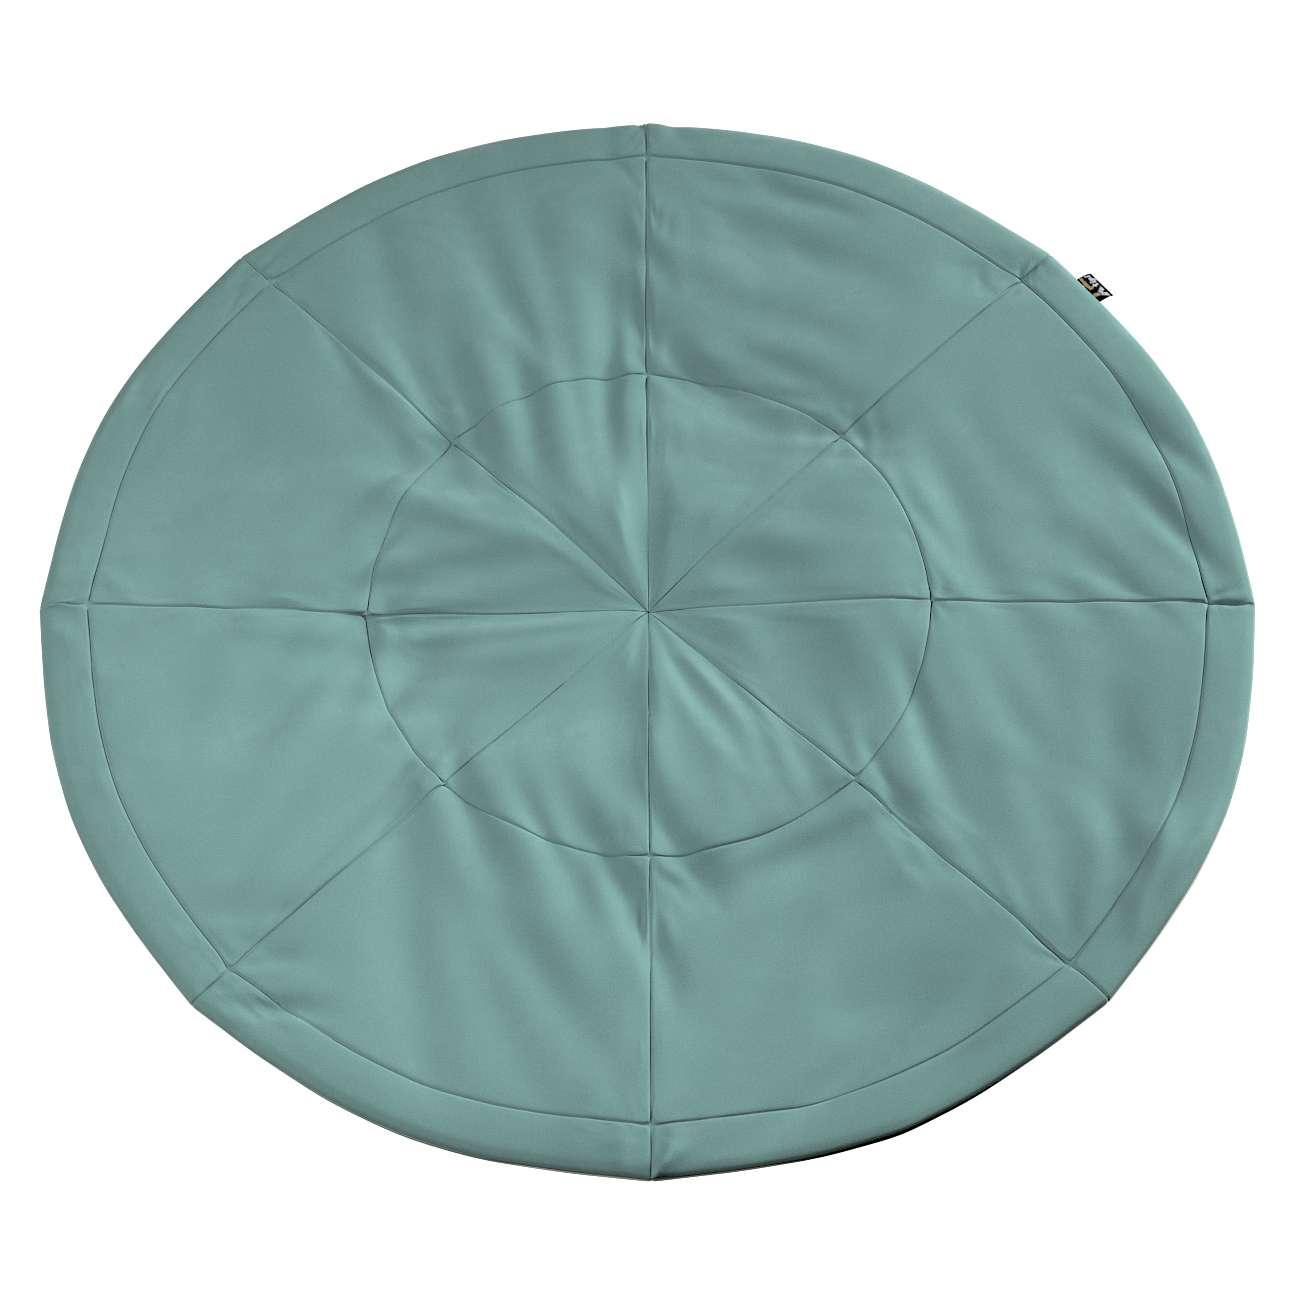 Round mat in collection Posh Velvet, fabric: 704-18